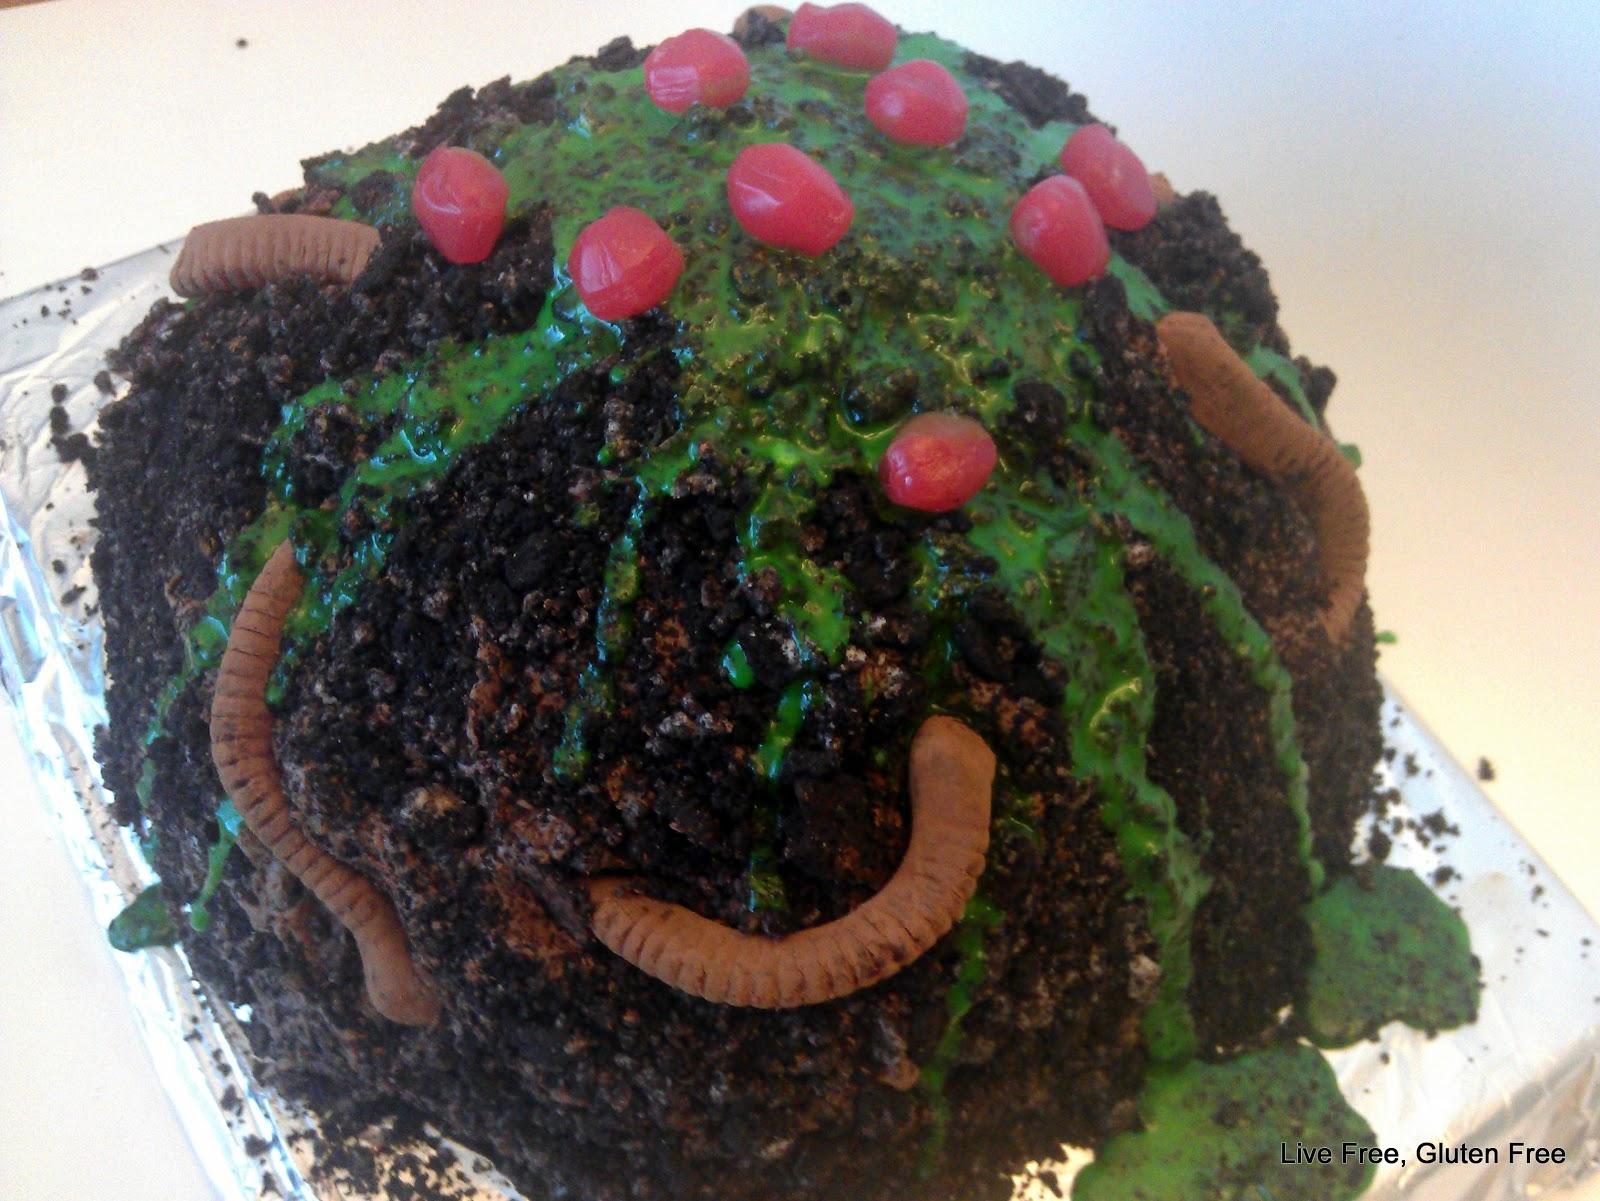 Live Free Gluten Free Max S Earthworm Cake